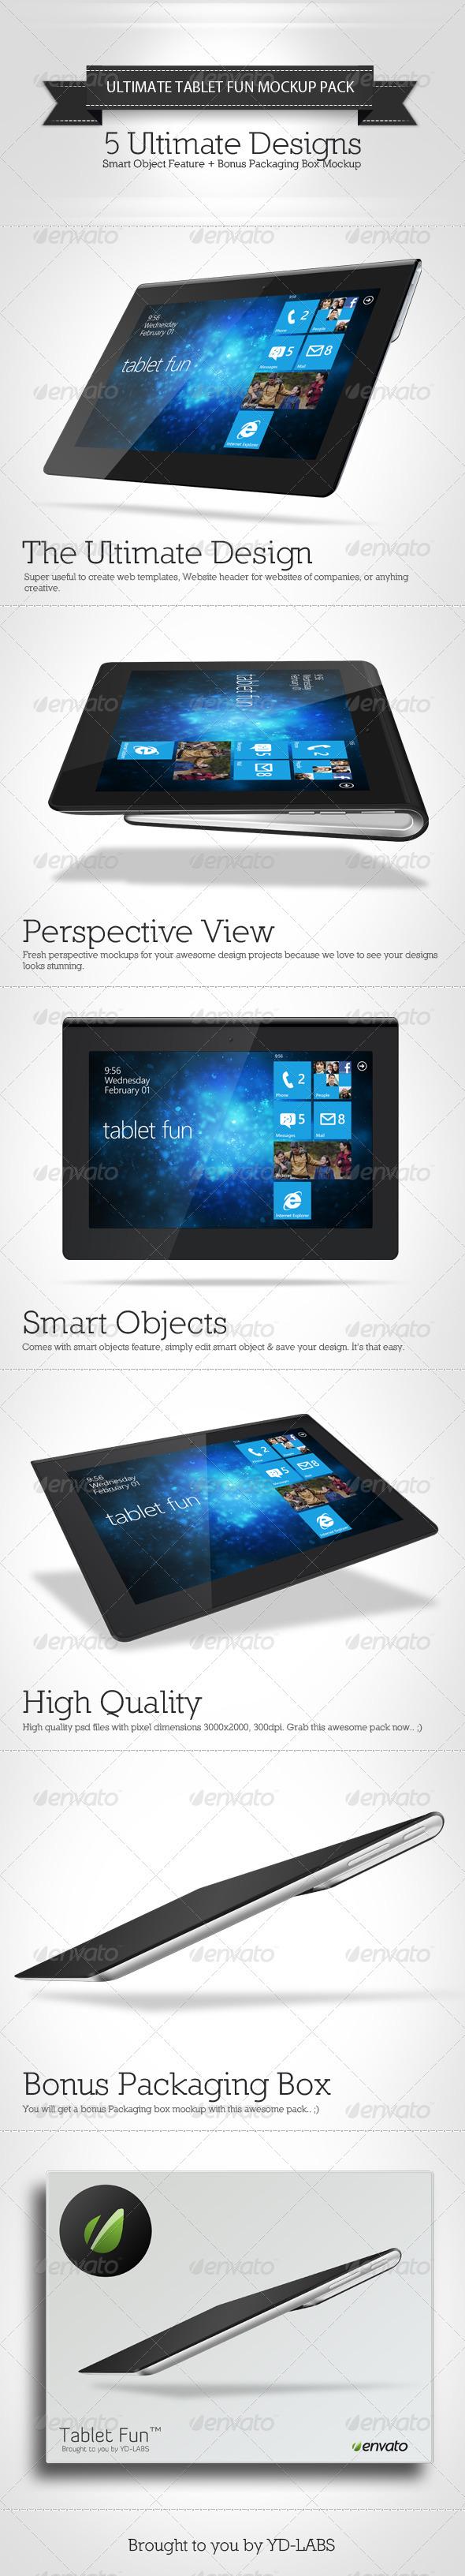 Tablet Fun Mockup Pack - Mobile Displays